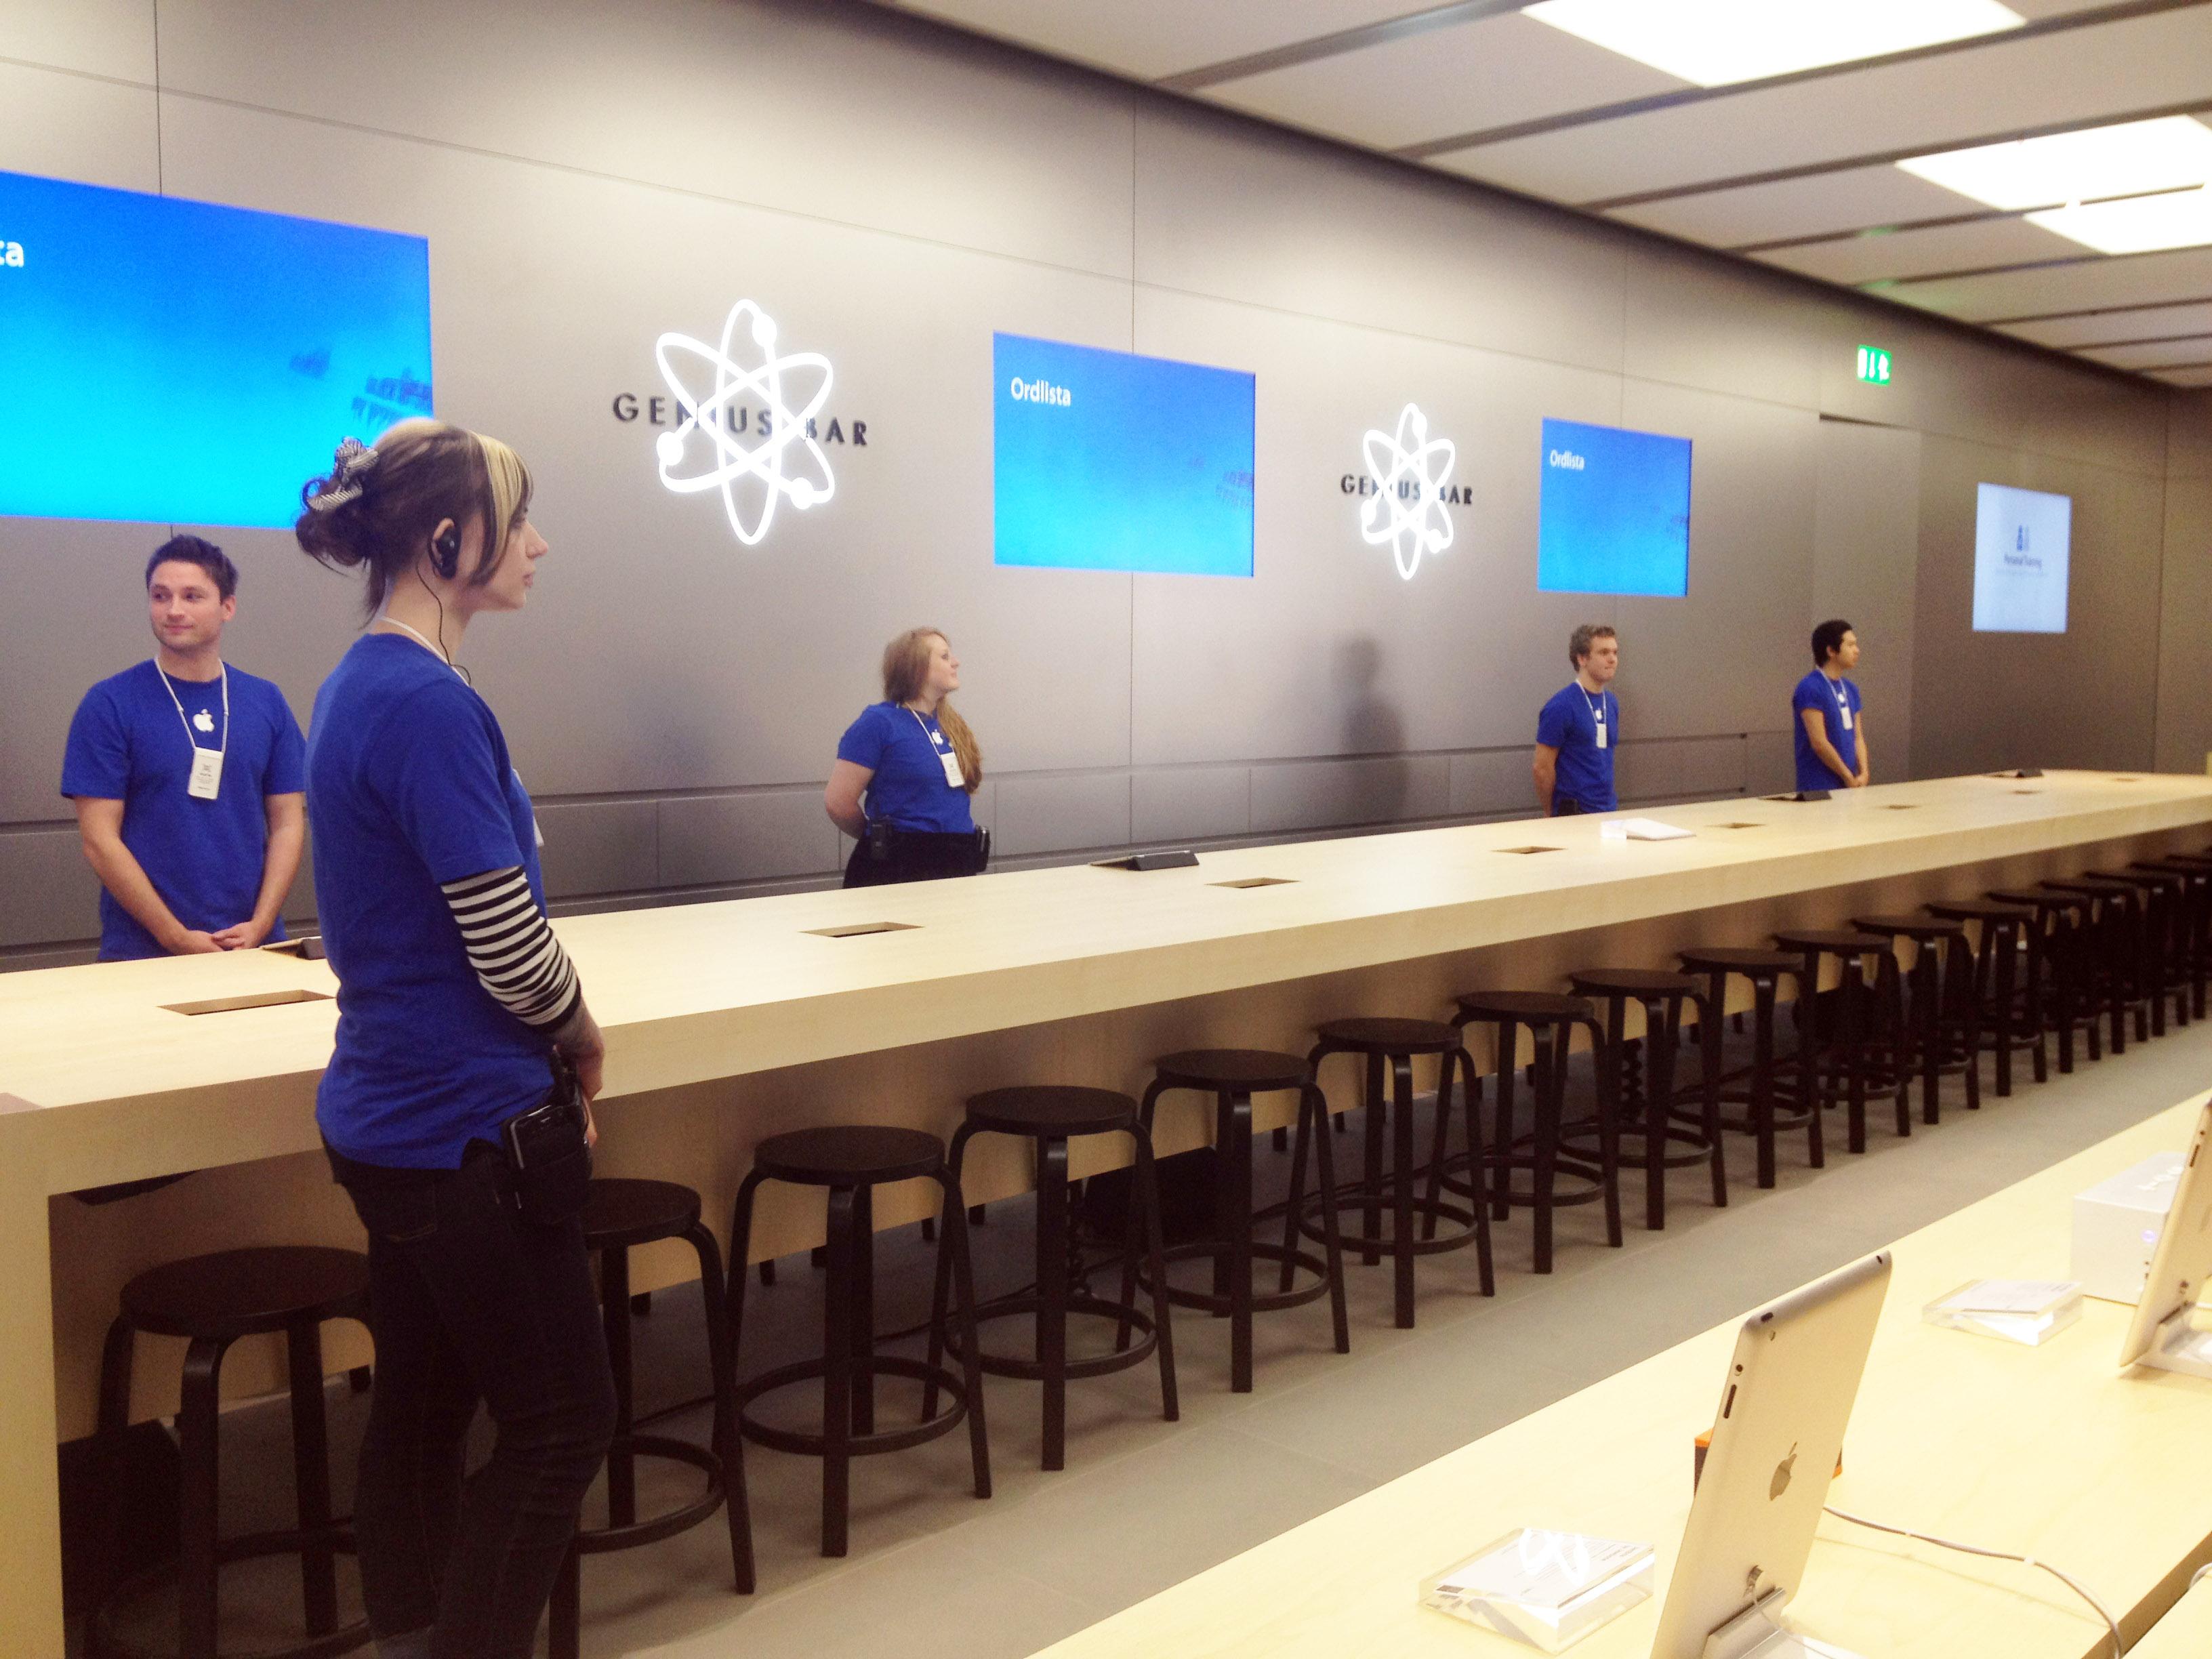 apple store interior stockholm rh interiorstockholm wordpress com apple store help desk appointment london apple store sydney help desk